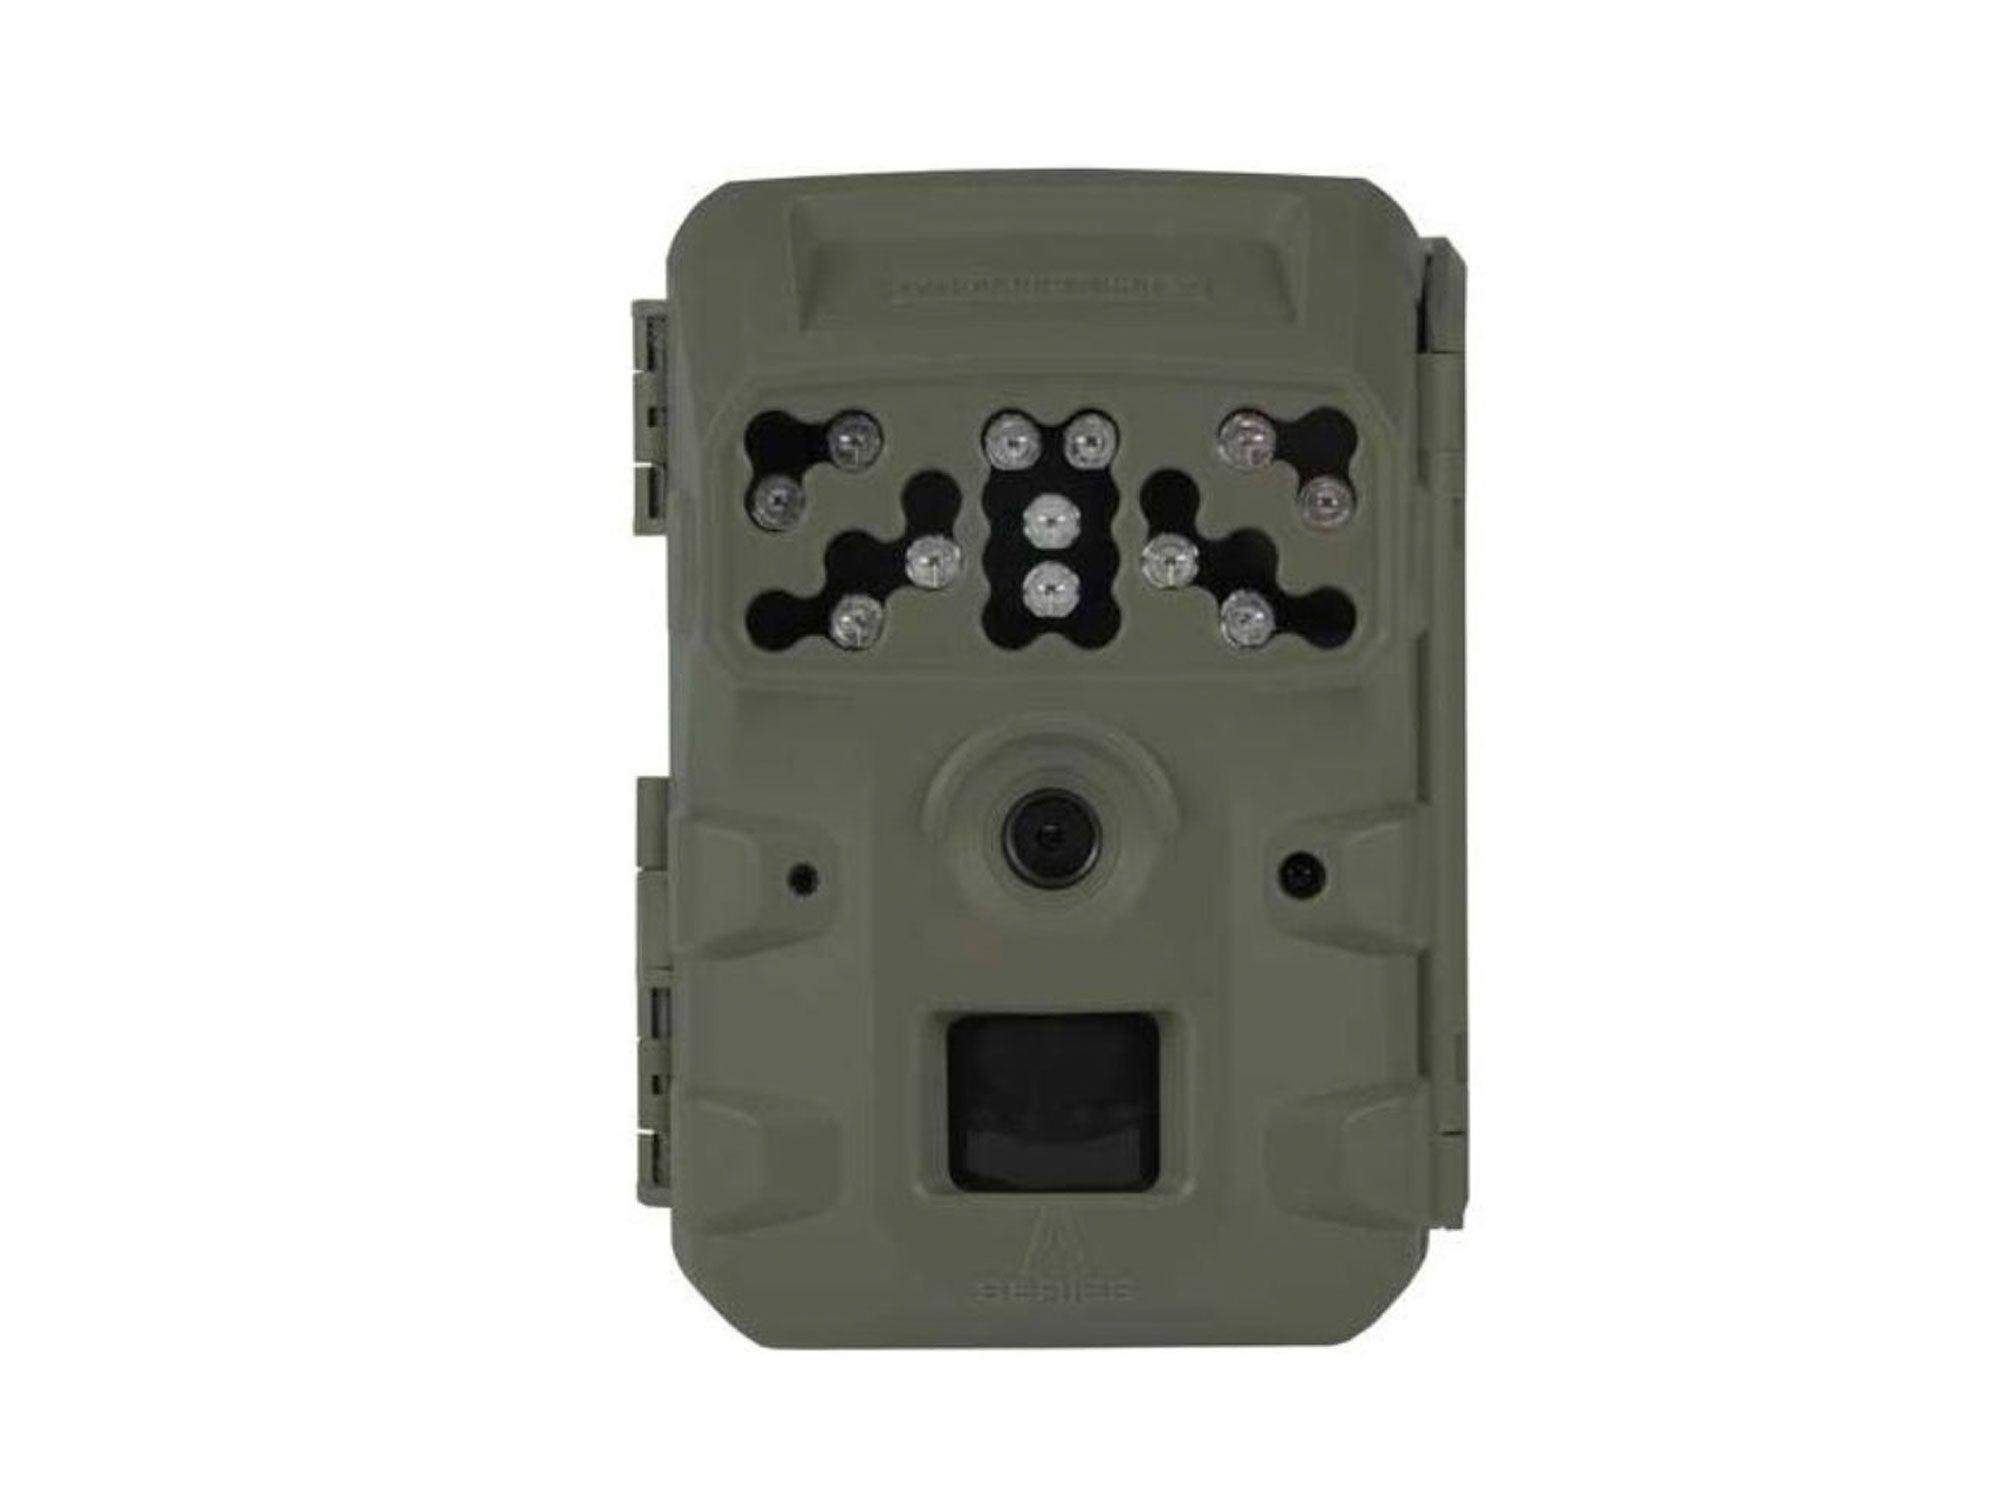 Moutrie trail camera